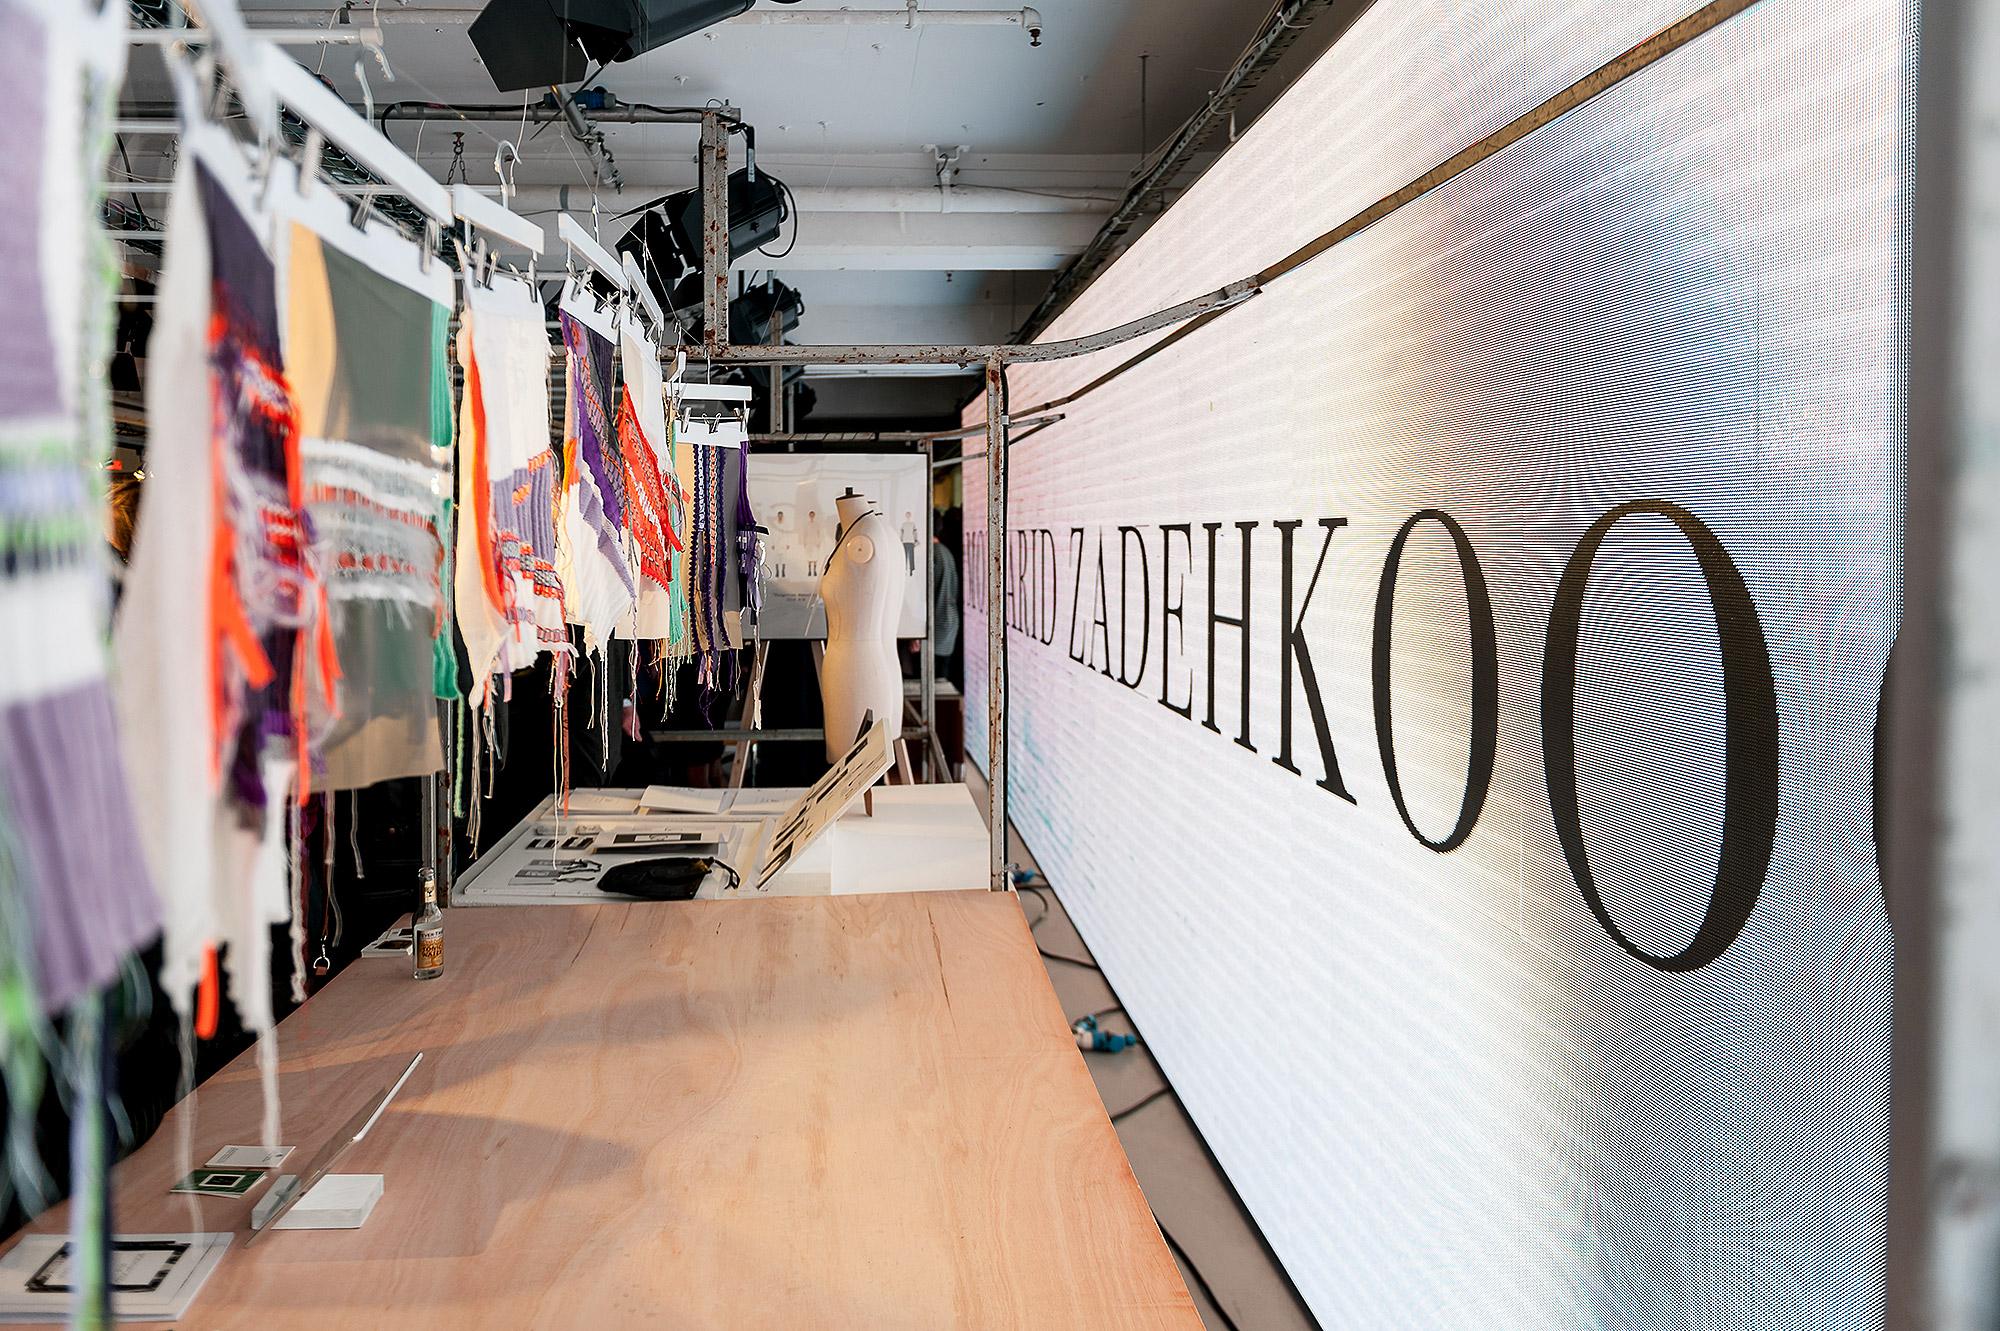 Exhibition Stand Fashion : Ma fashion show degree course london